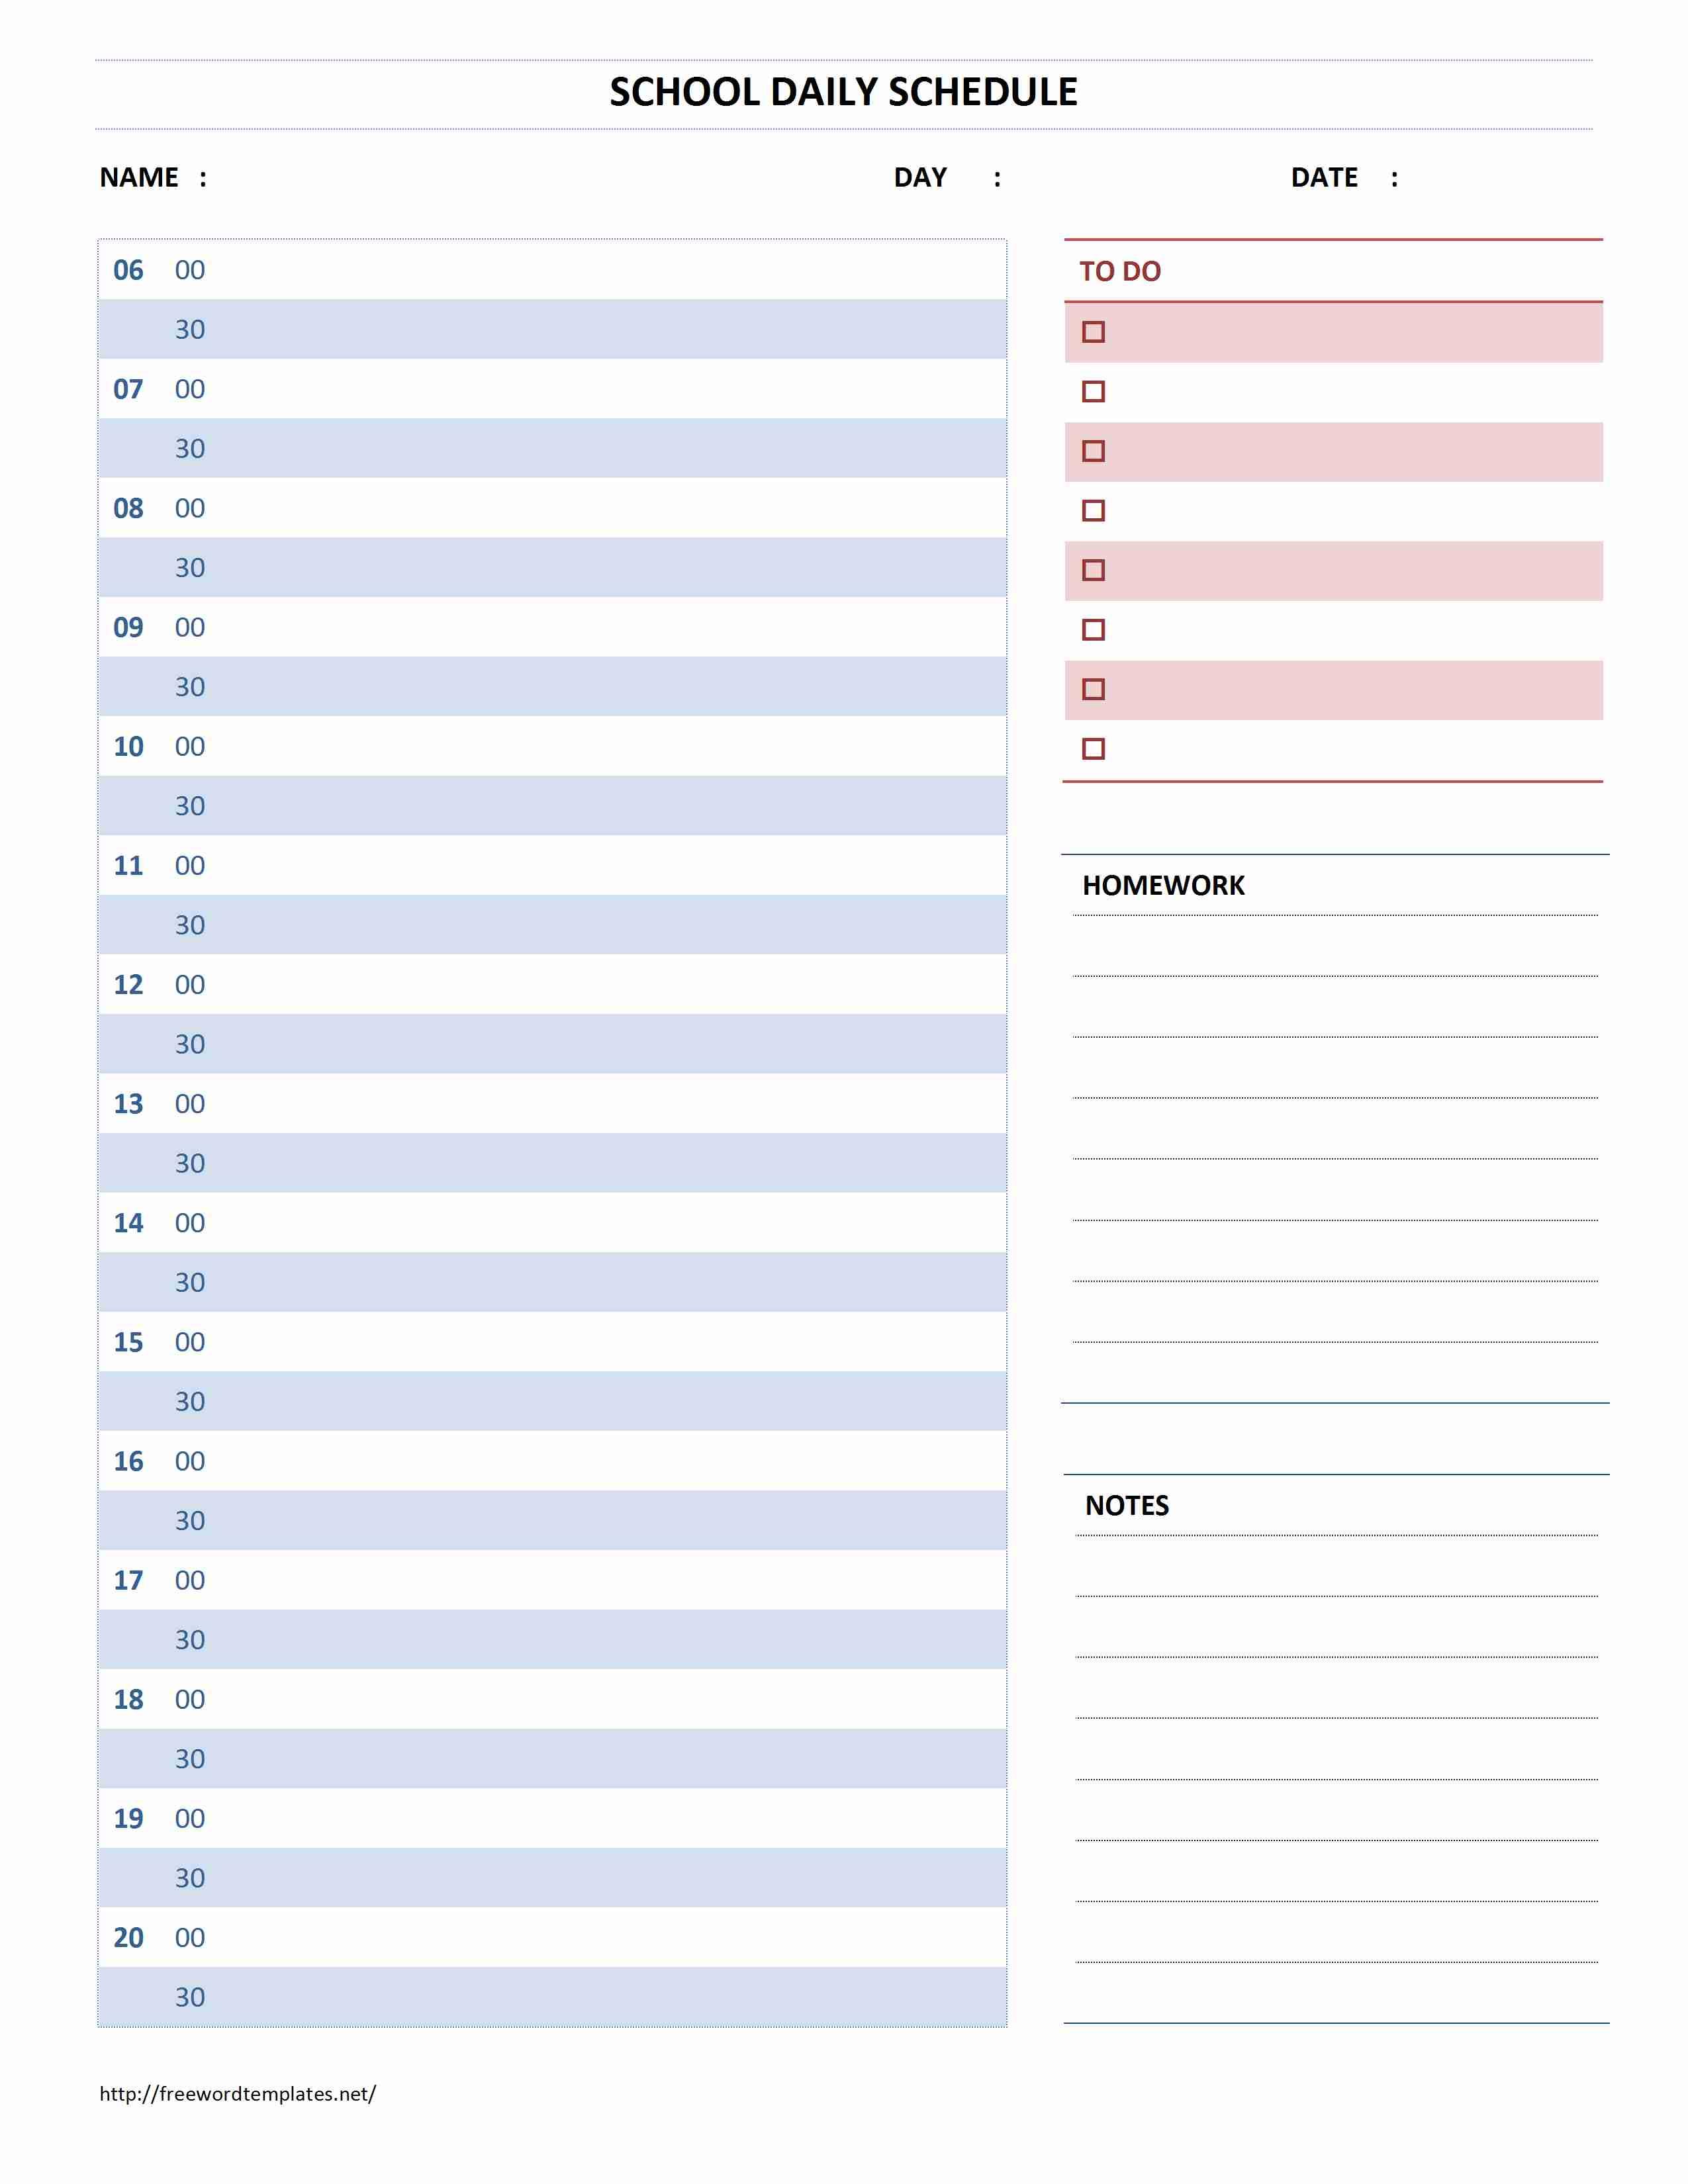 School Daily Schedule